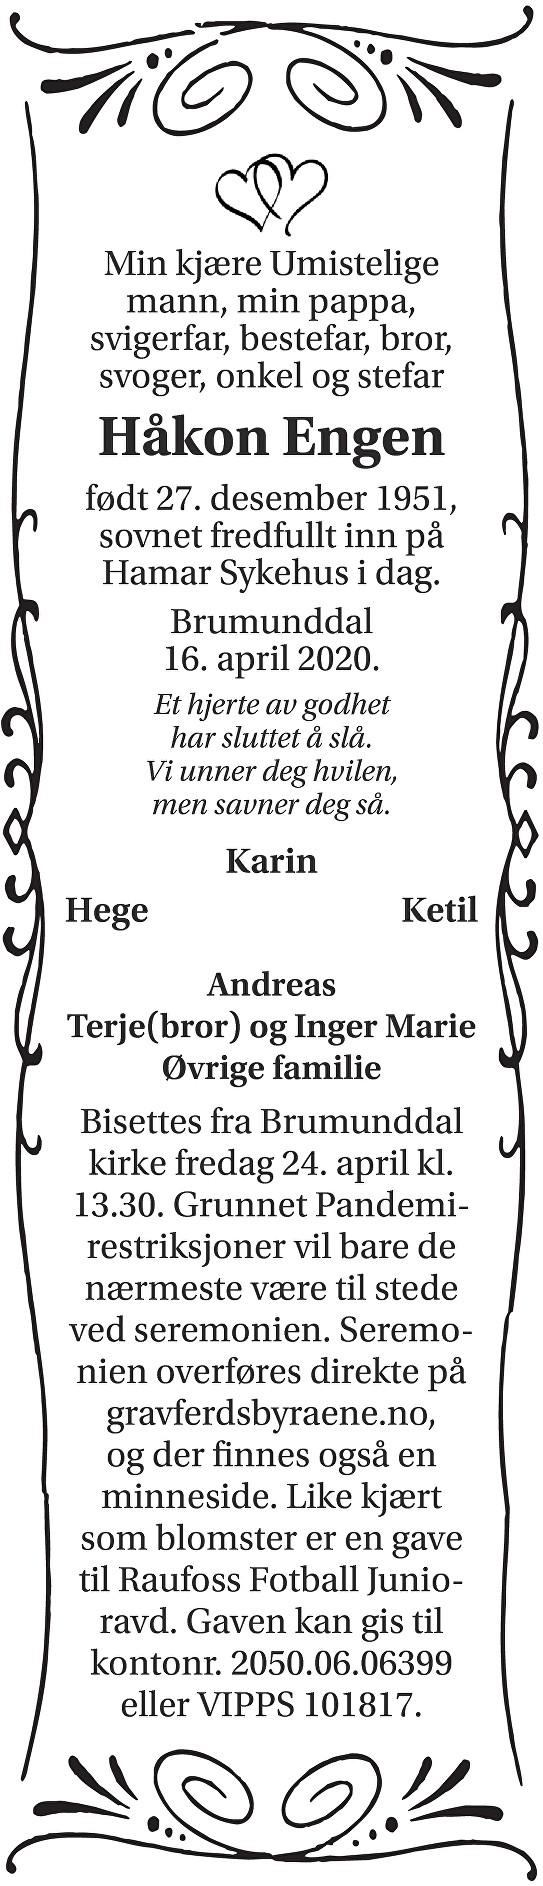 Håkon Engen Dødsannonse